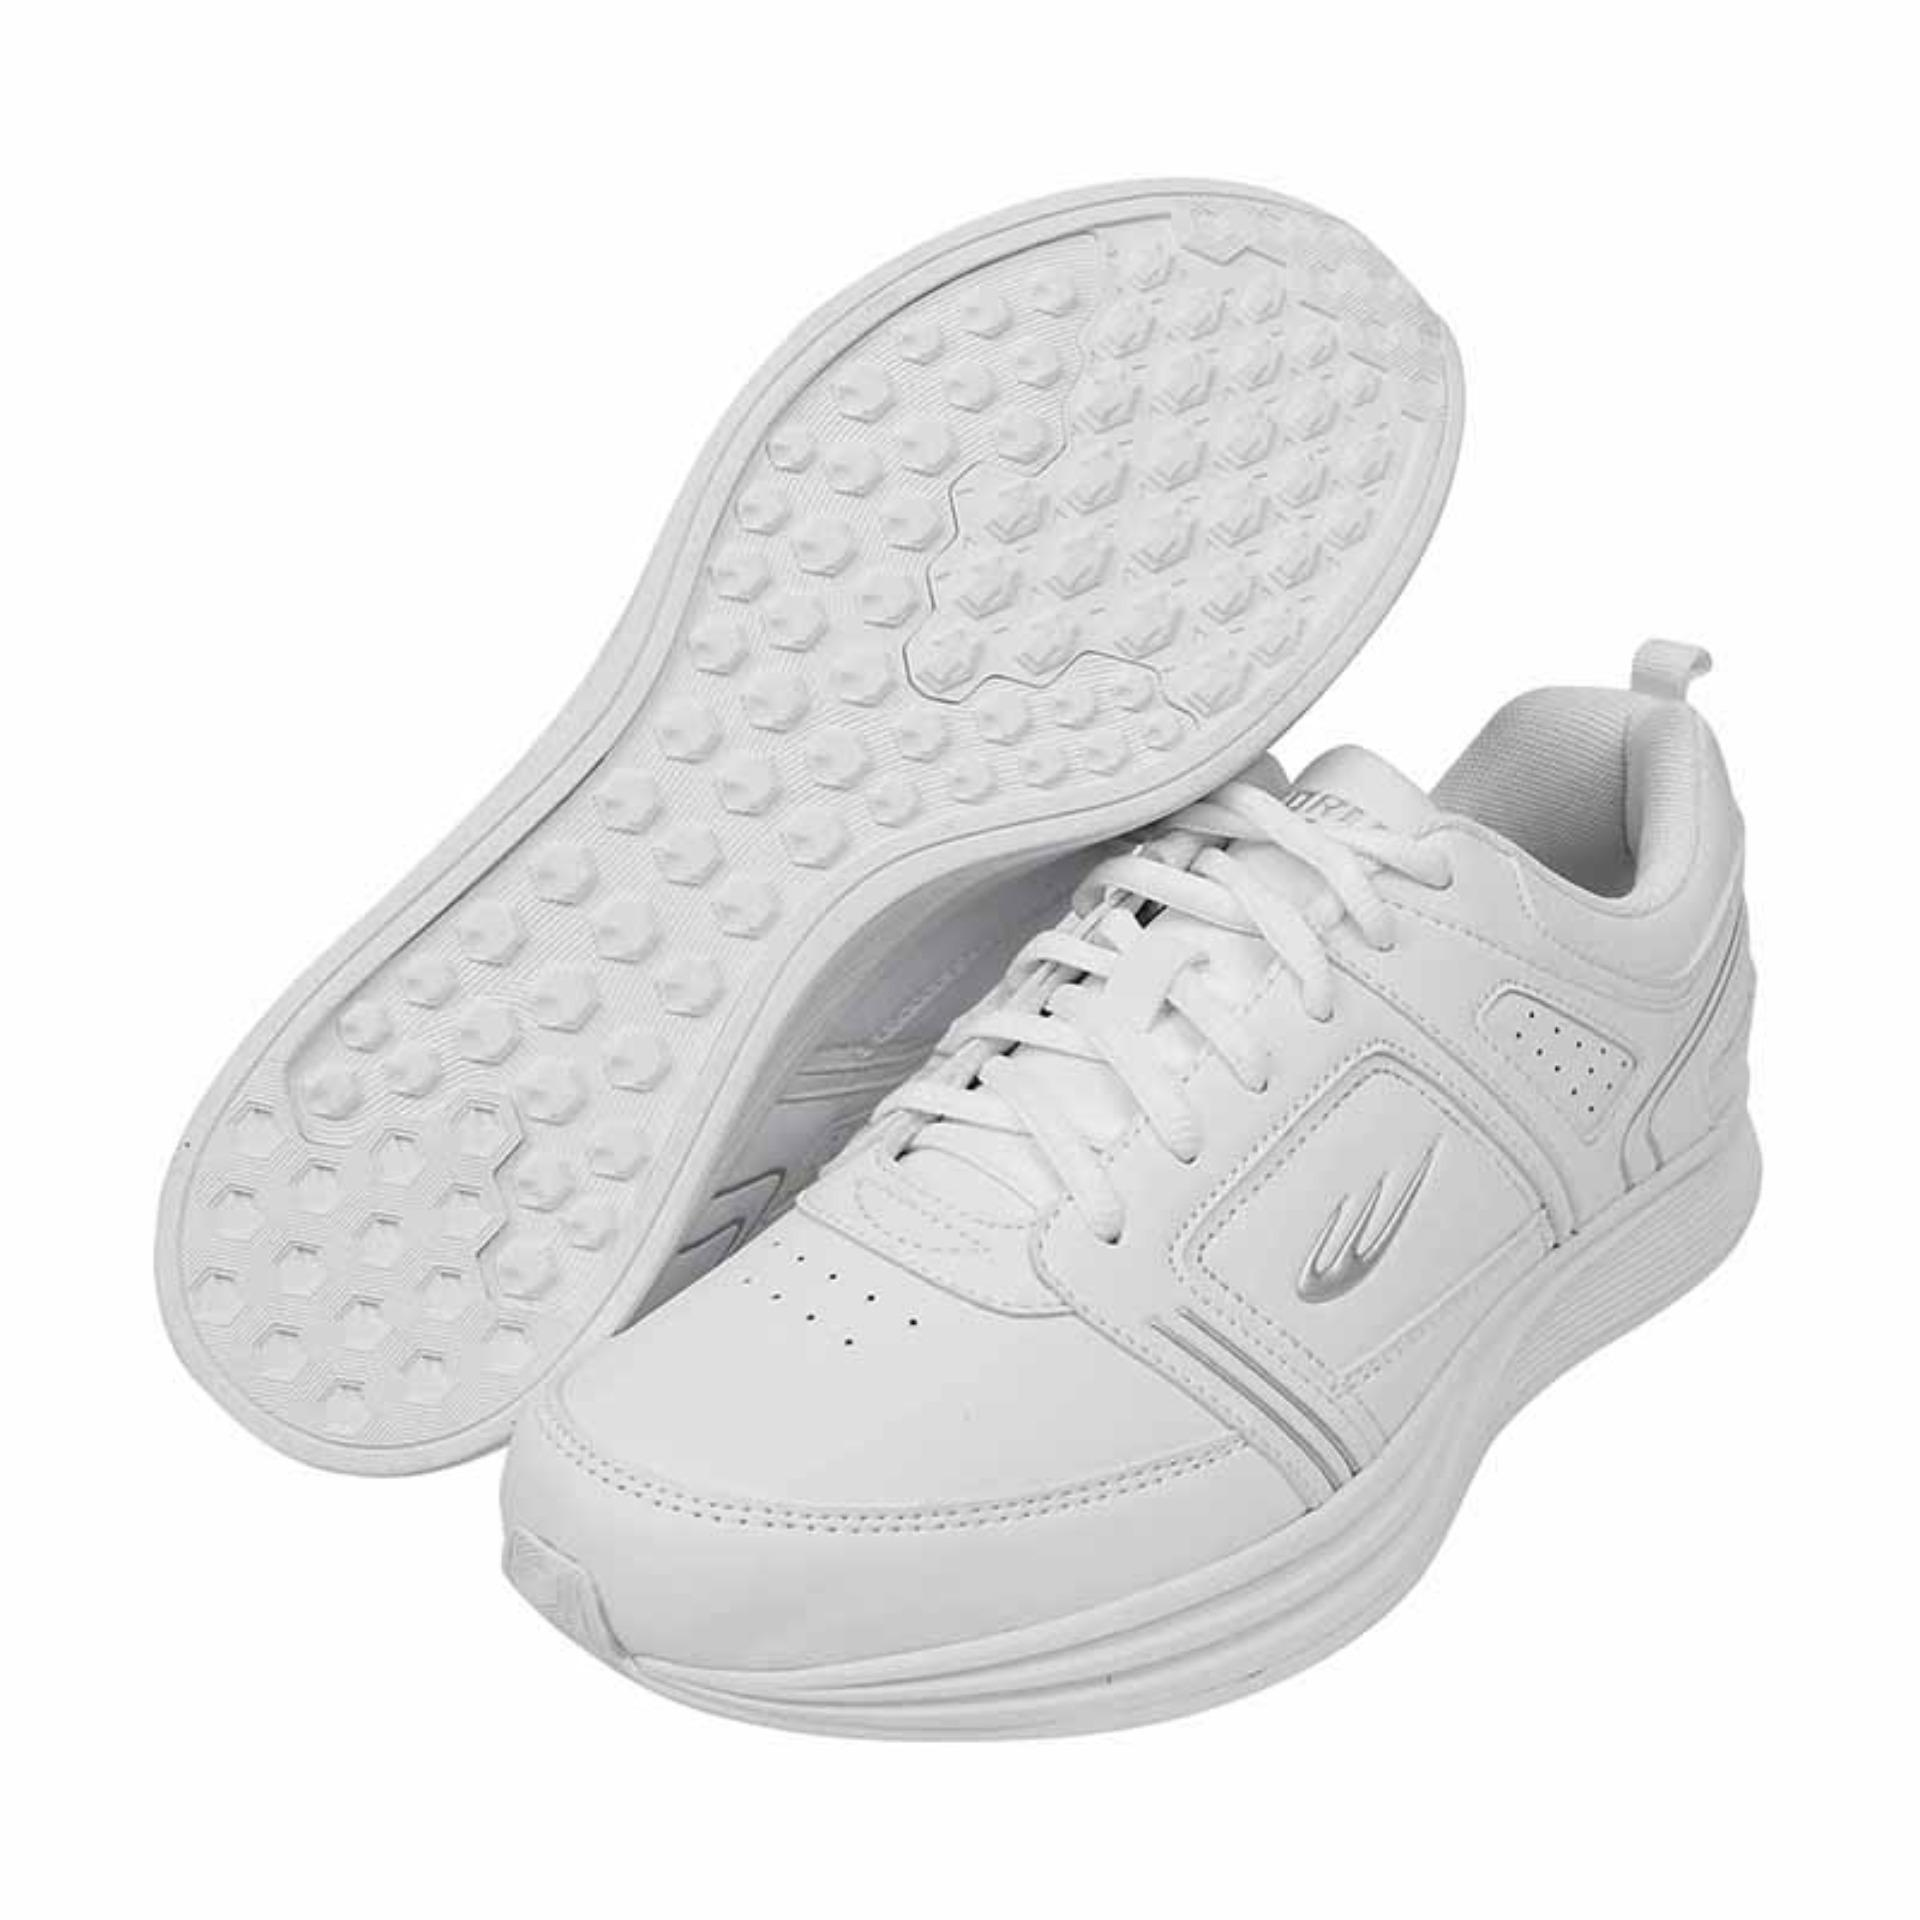 world balance shoes white style guru fashion glitz